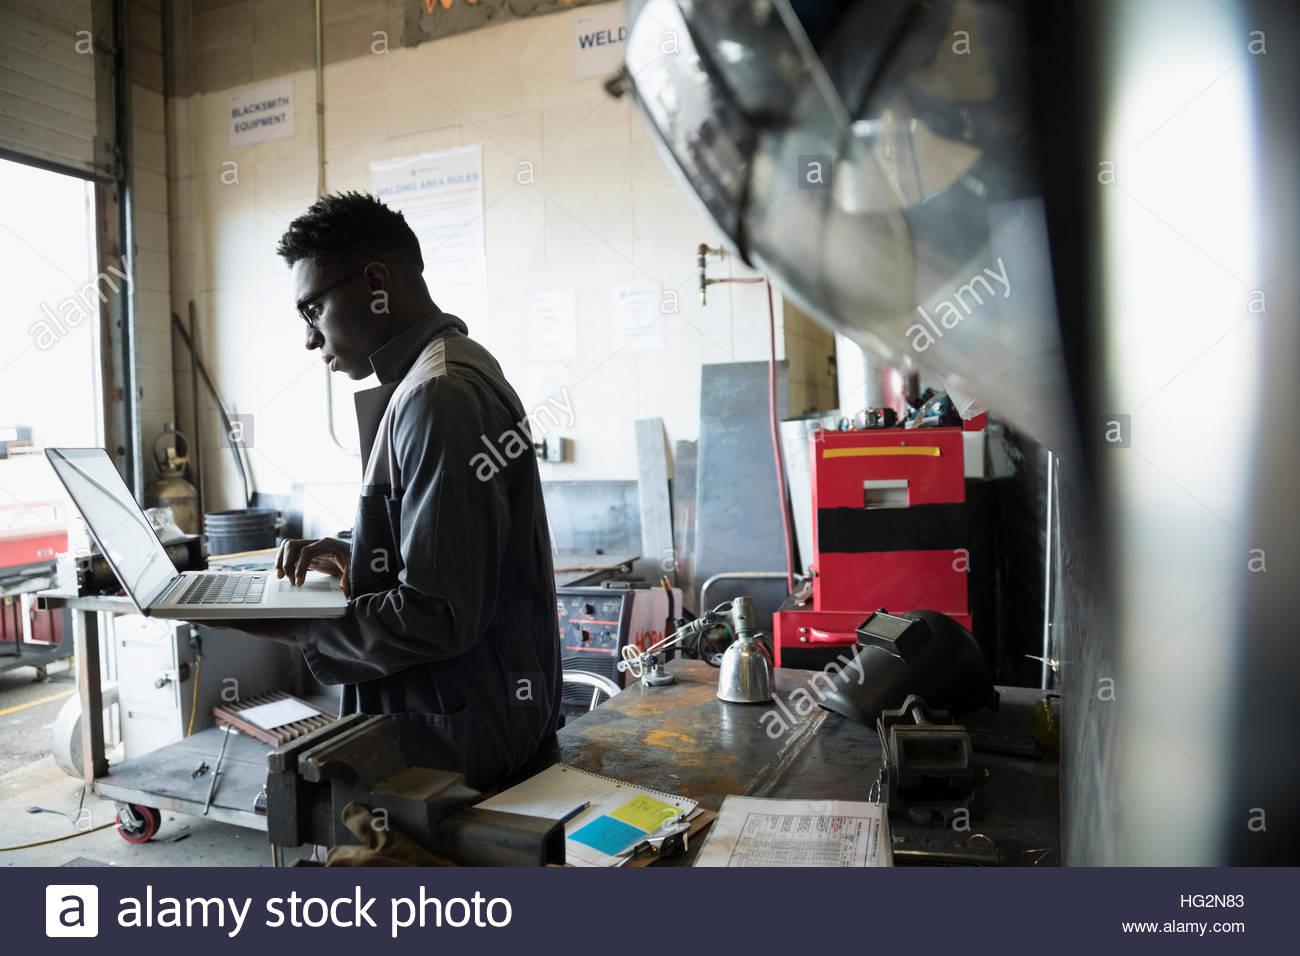 Design professional engineer using laptop in workshop - Stock Image